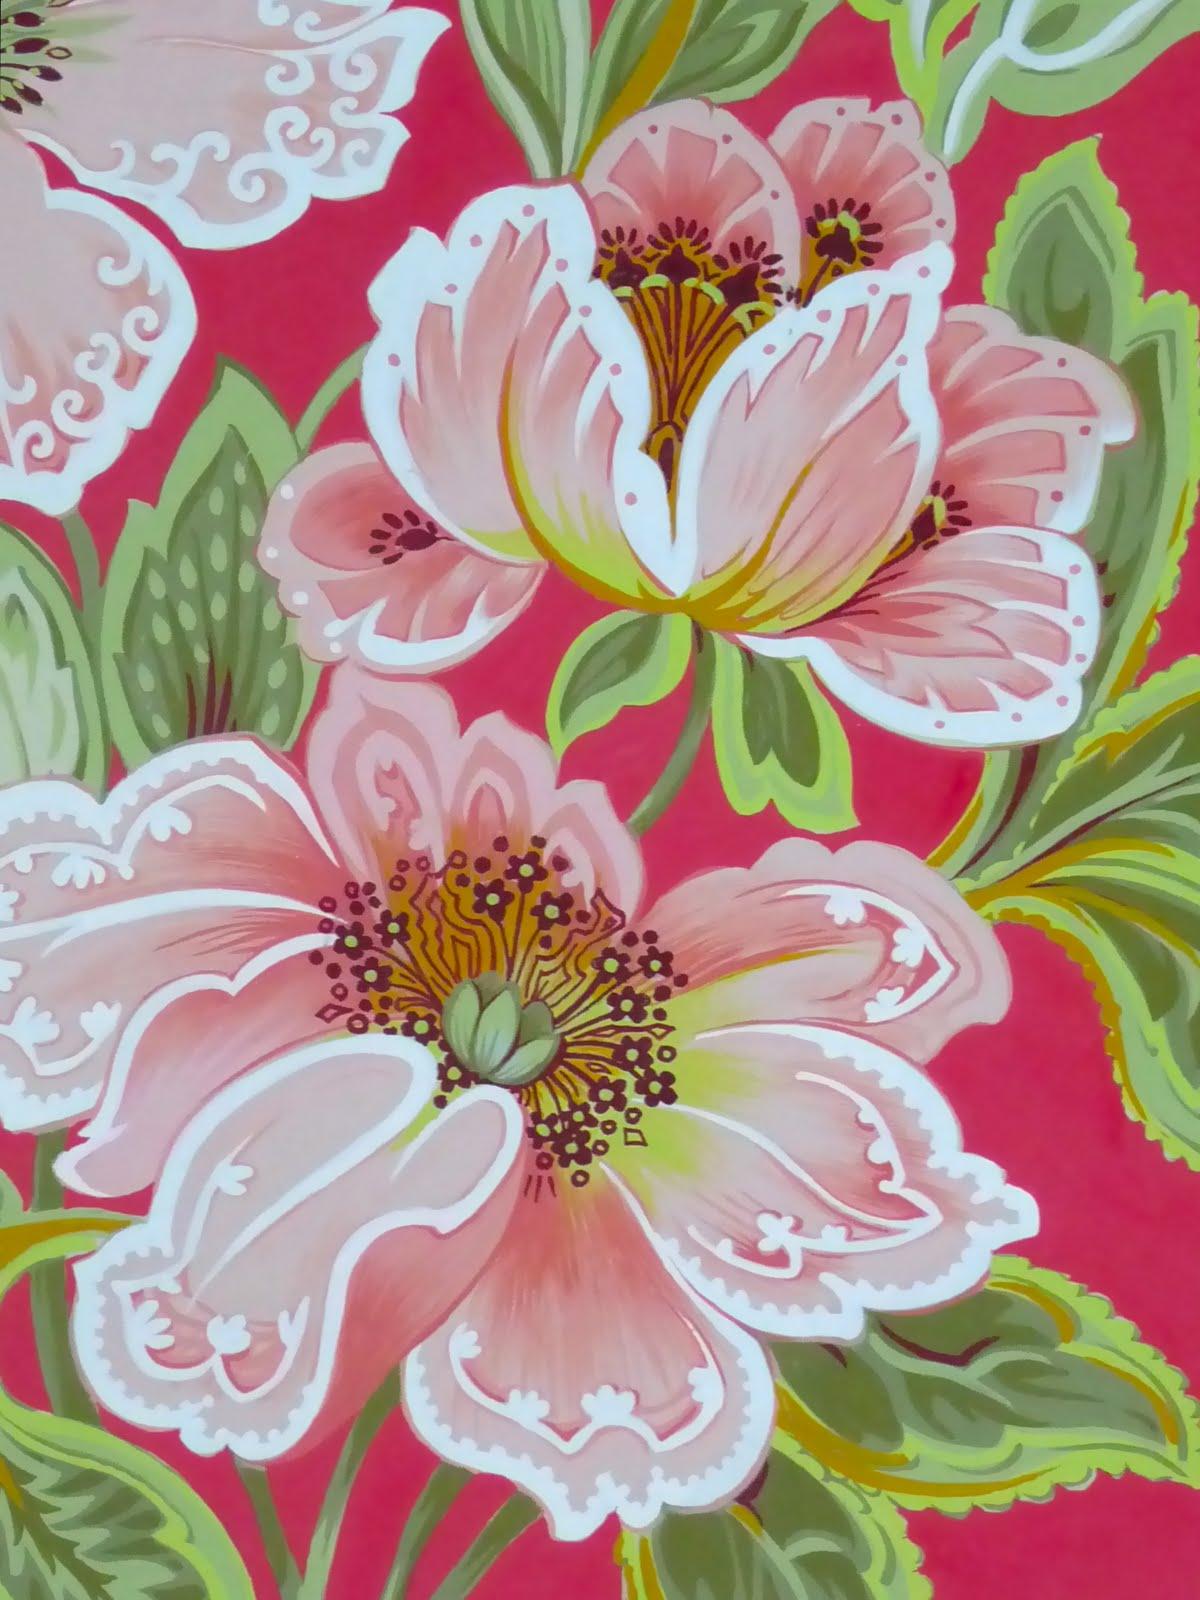 Eye for design decorating rose patterned interiors - Introir dijane ...